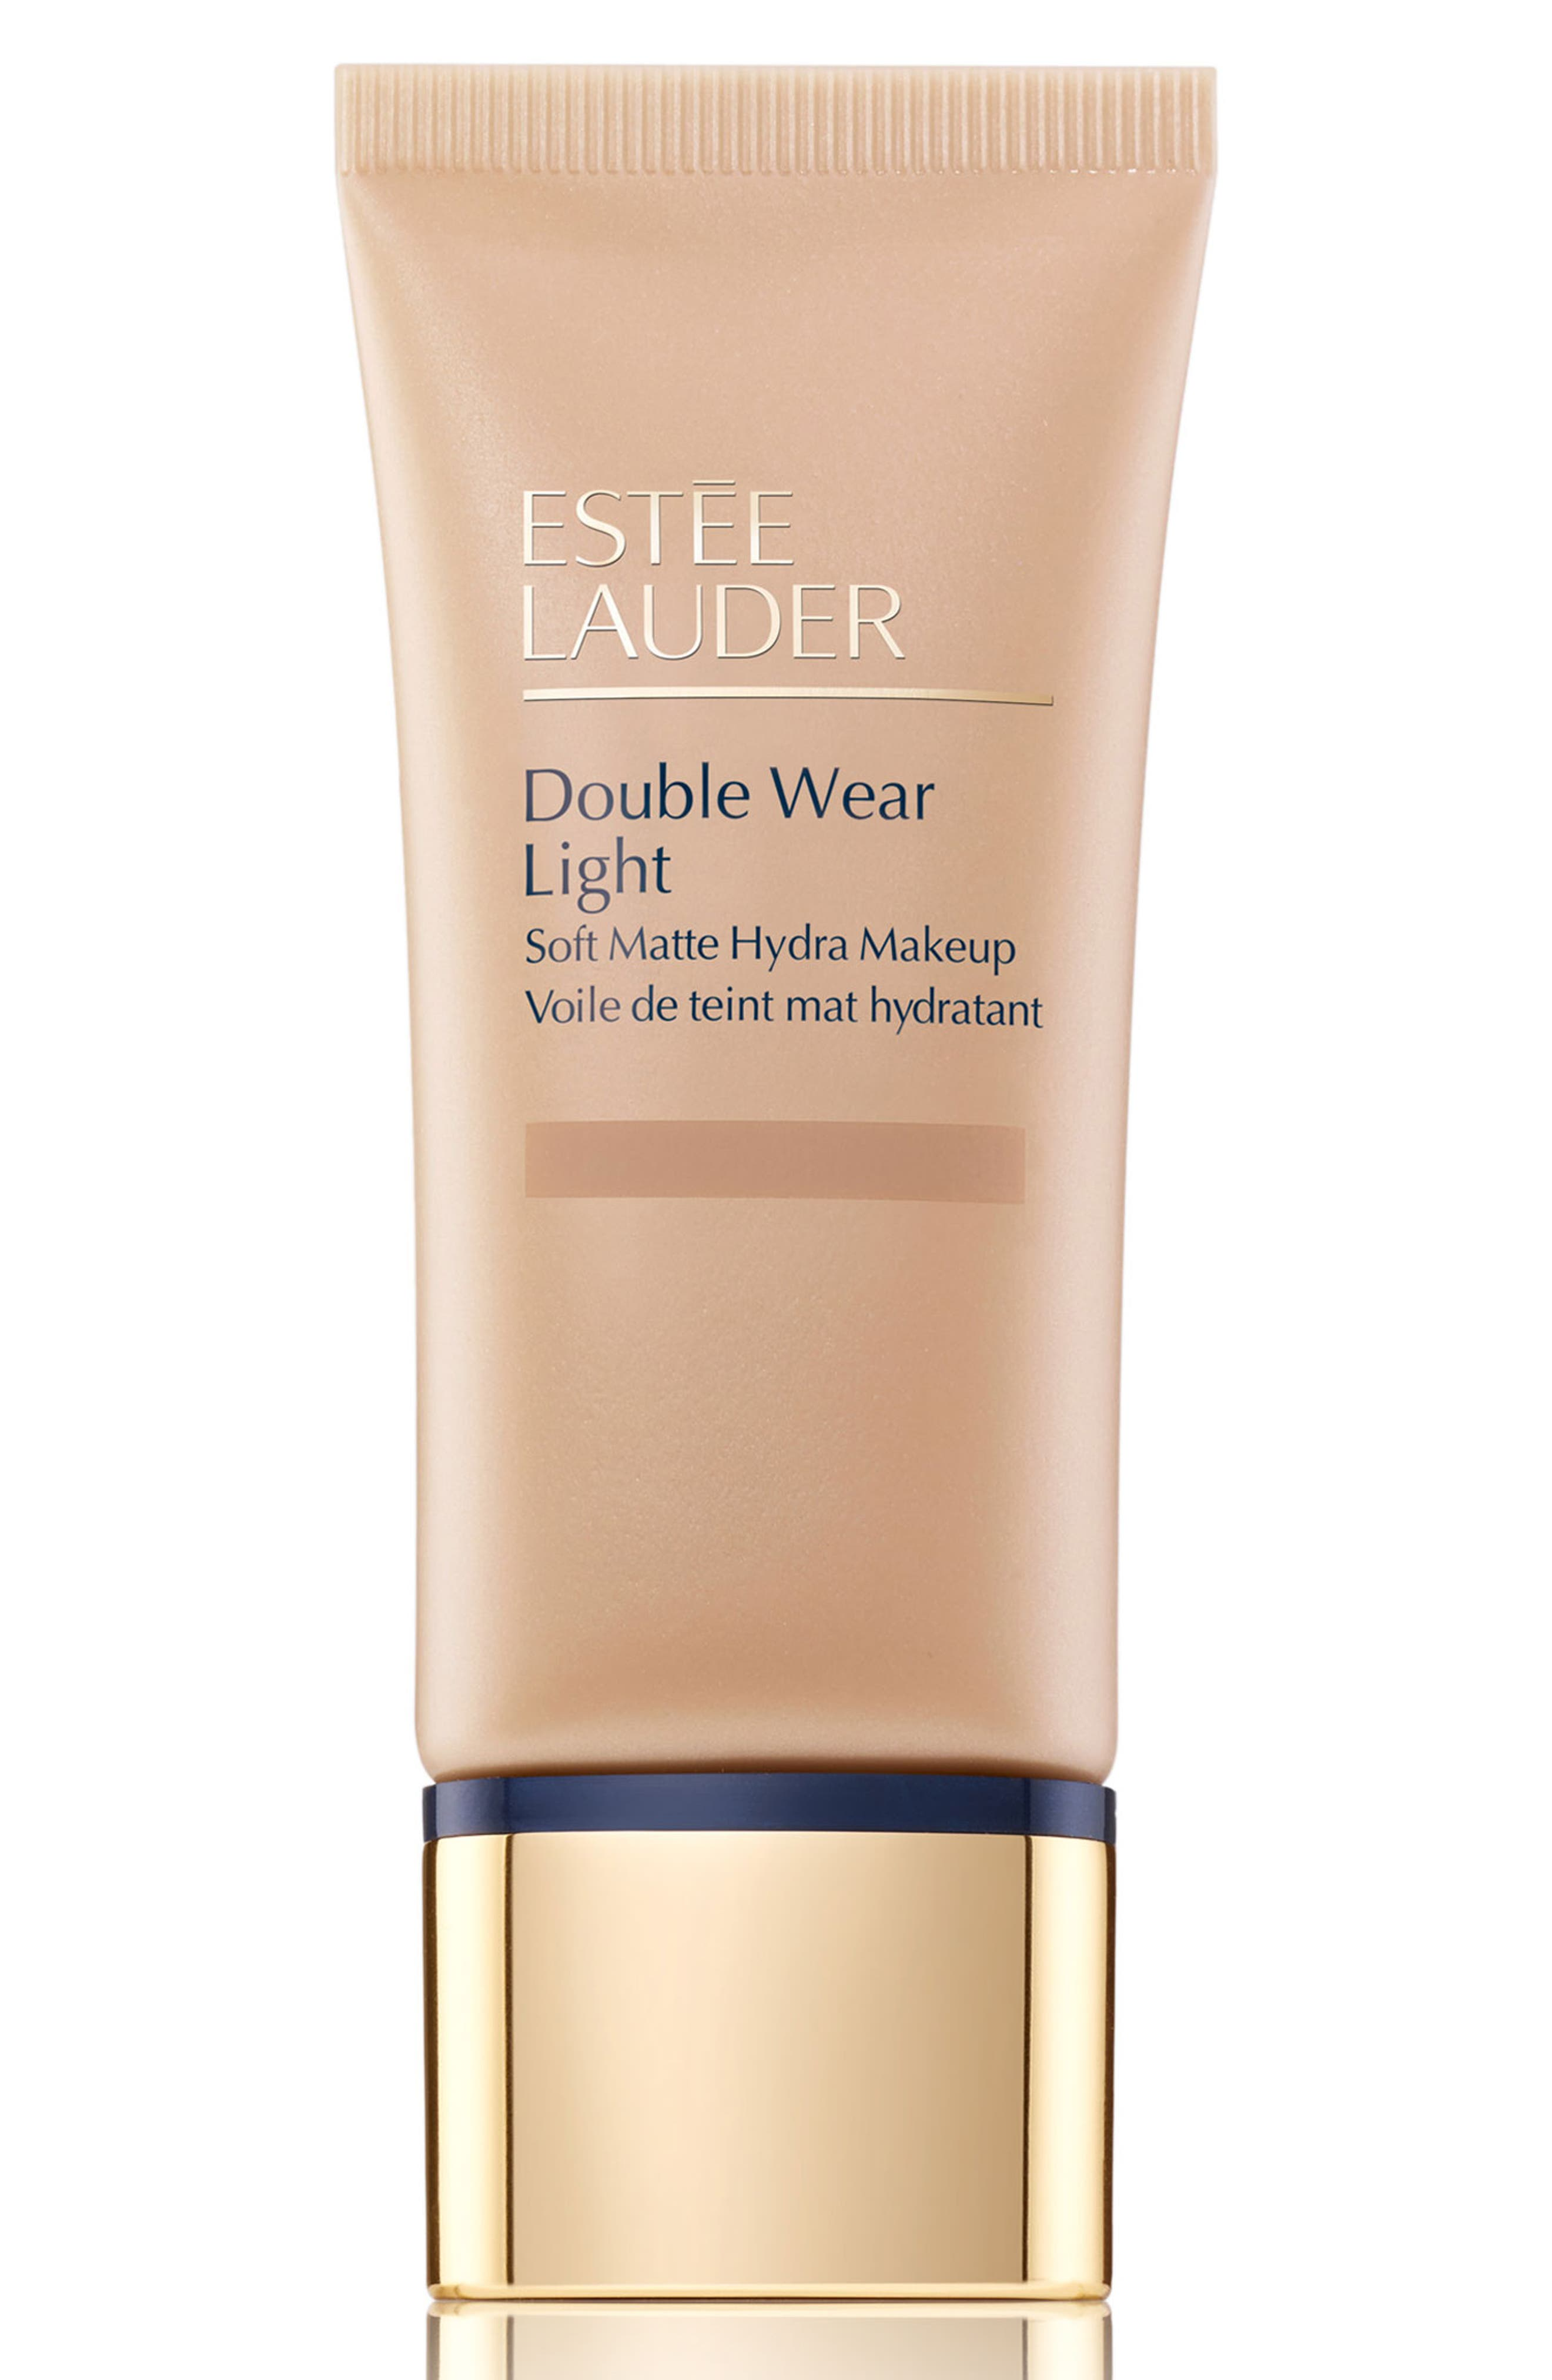 Estee Lauder Double Wear Light Soft Matte Hydra Makeup - 2C3 Fresco